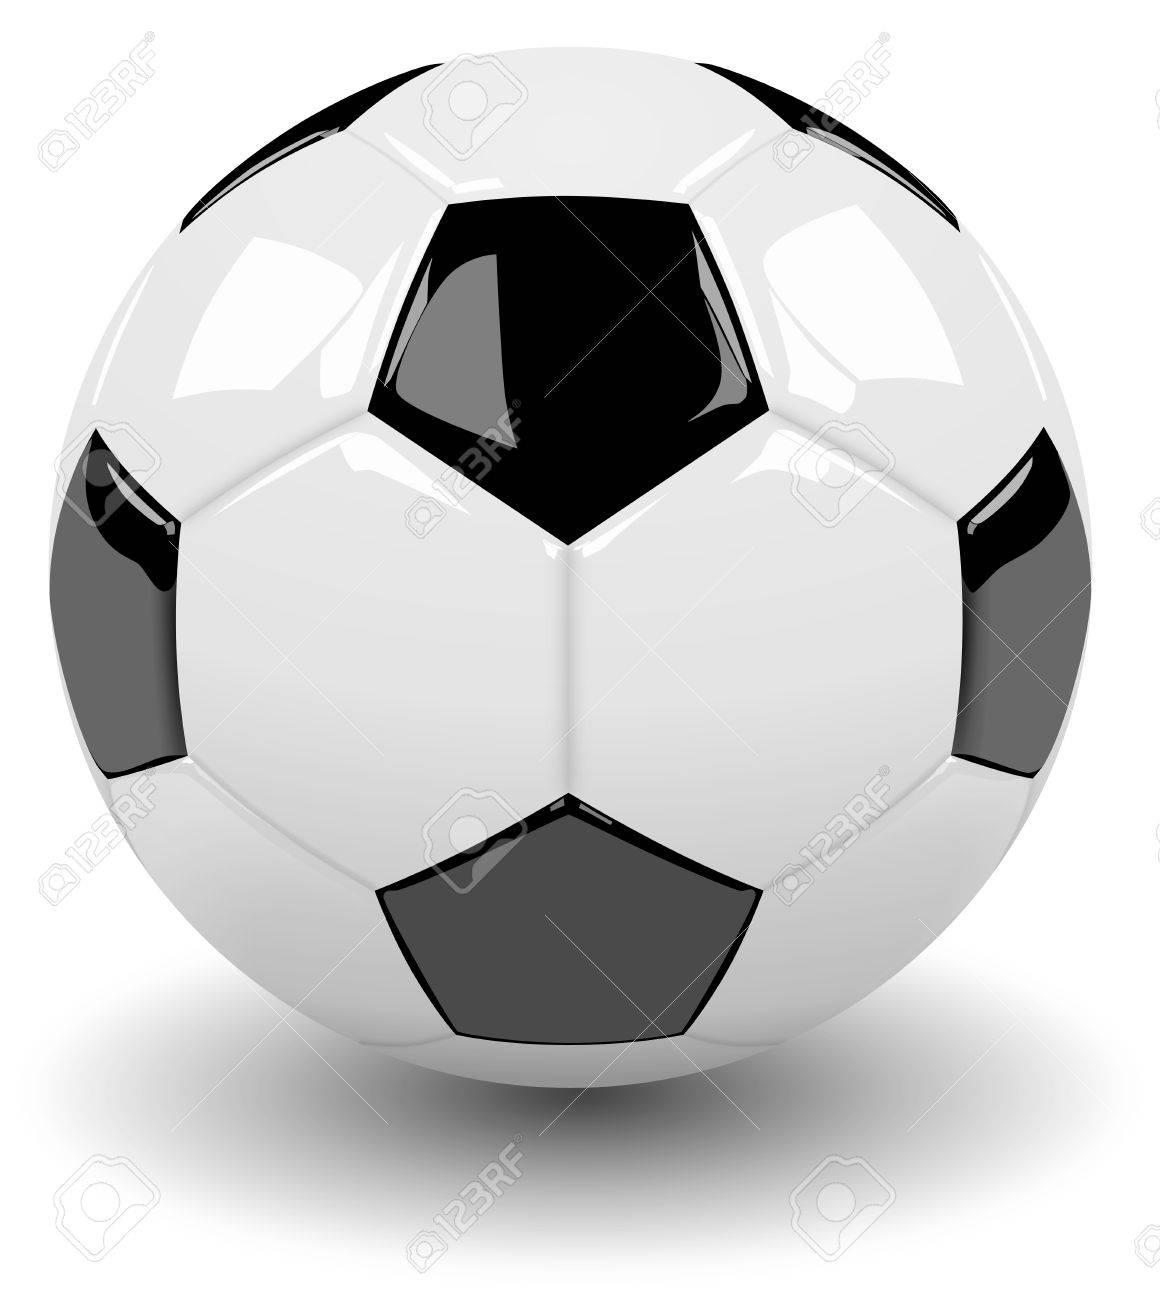 1160x1300 Black And White Soccer Ball